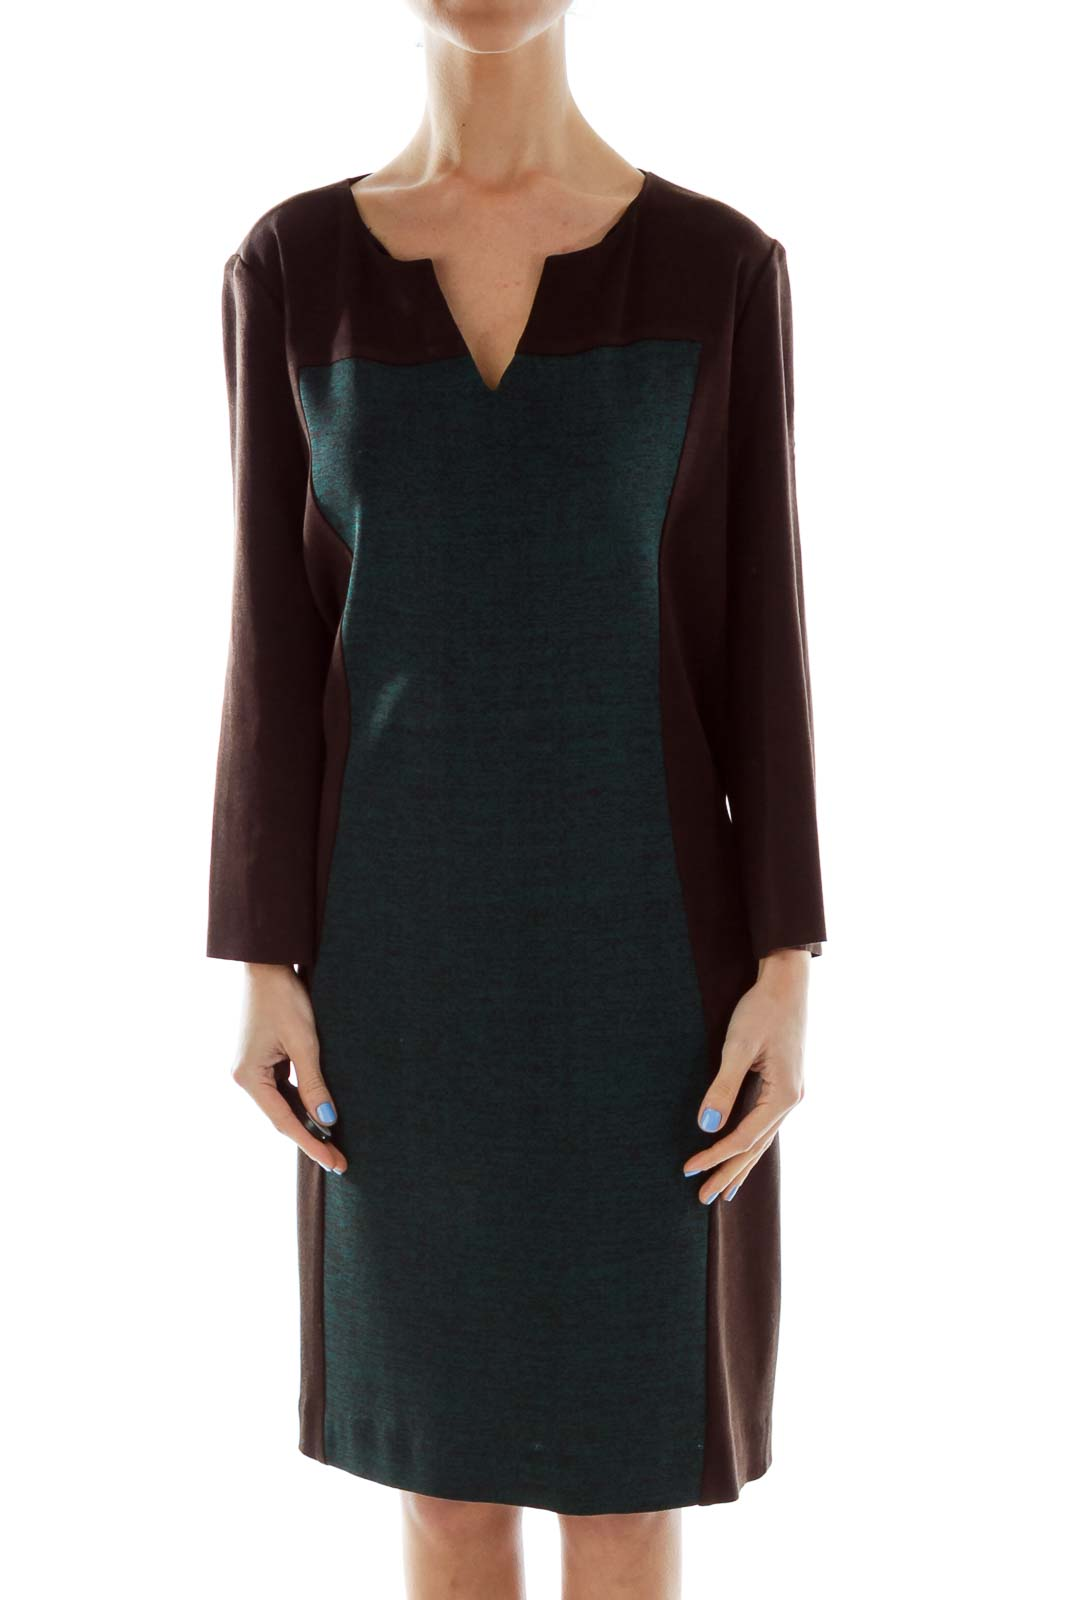 Brown Green Color Block Work Dress Front